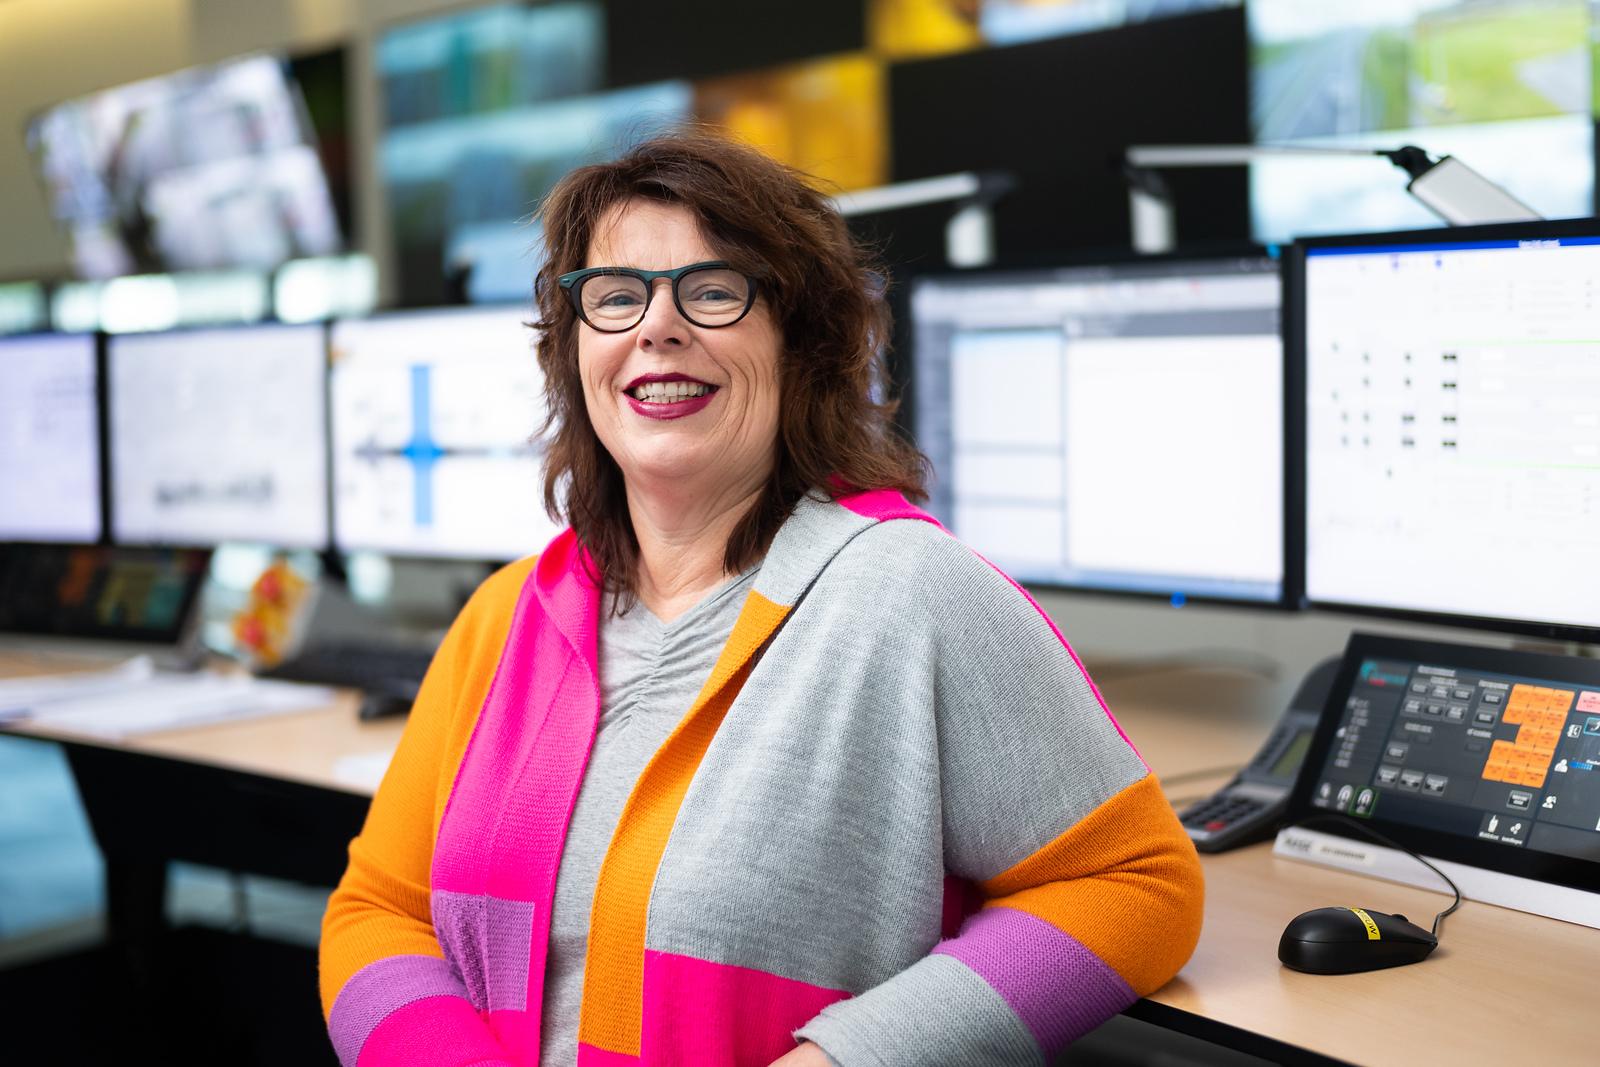 Operator Mariette